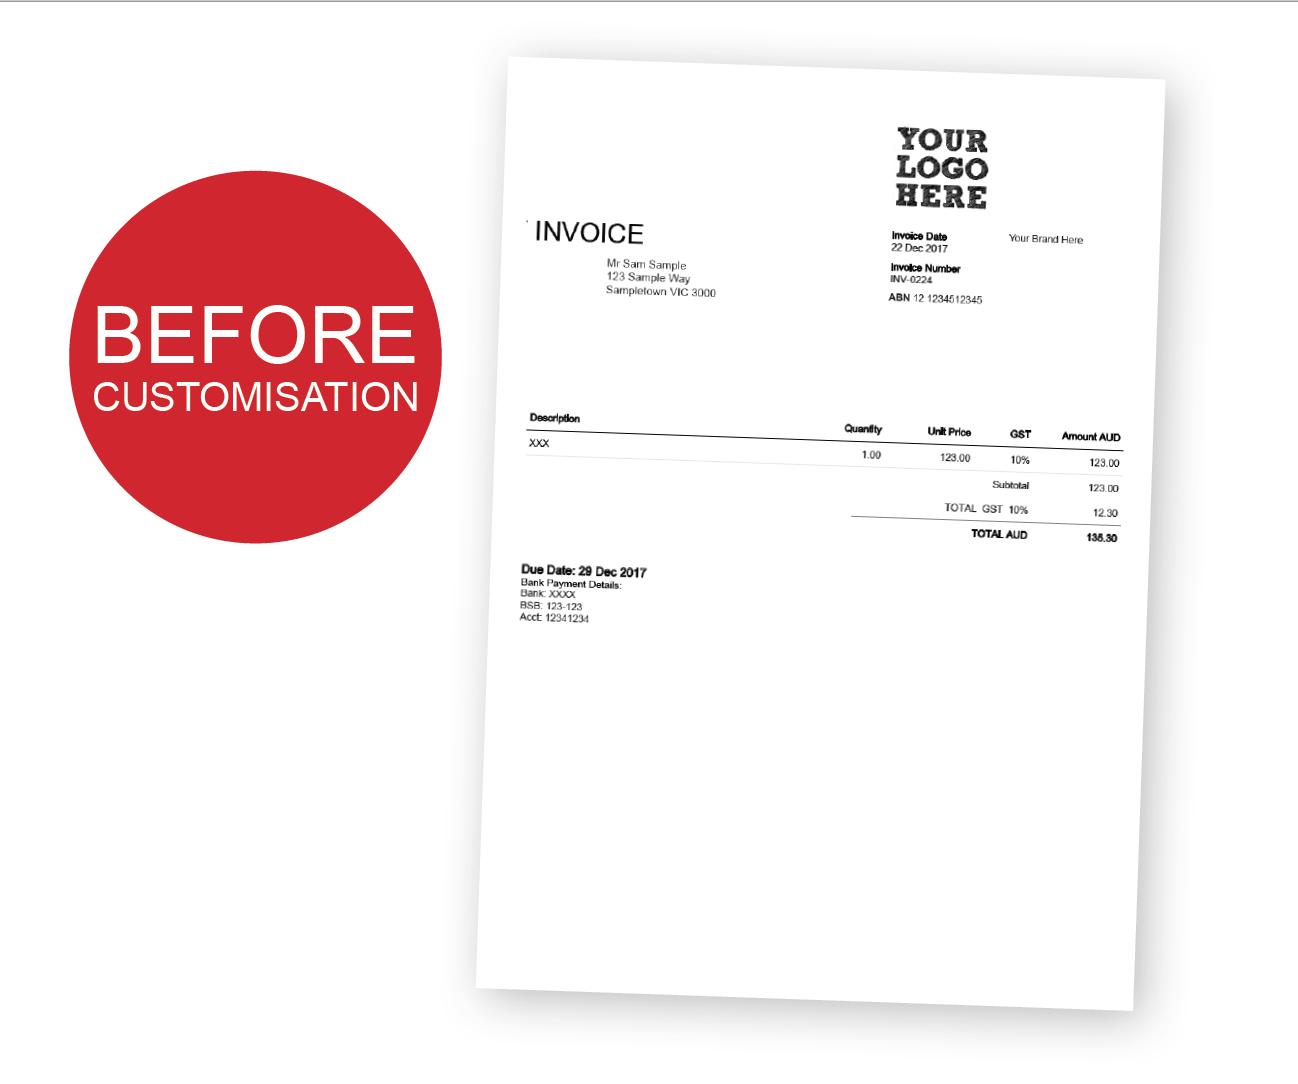 Custom Xero Templates Designed For Business  Docx Branding Themes Pertaining To Xero Custom Invoice Template